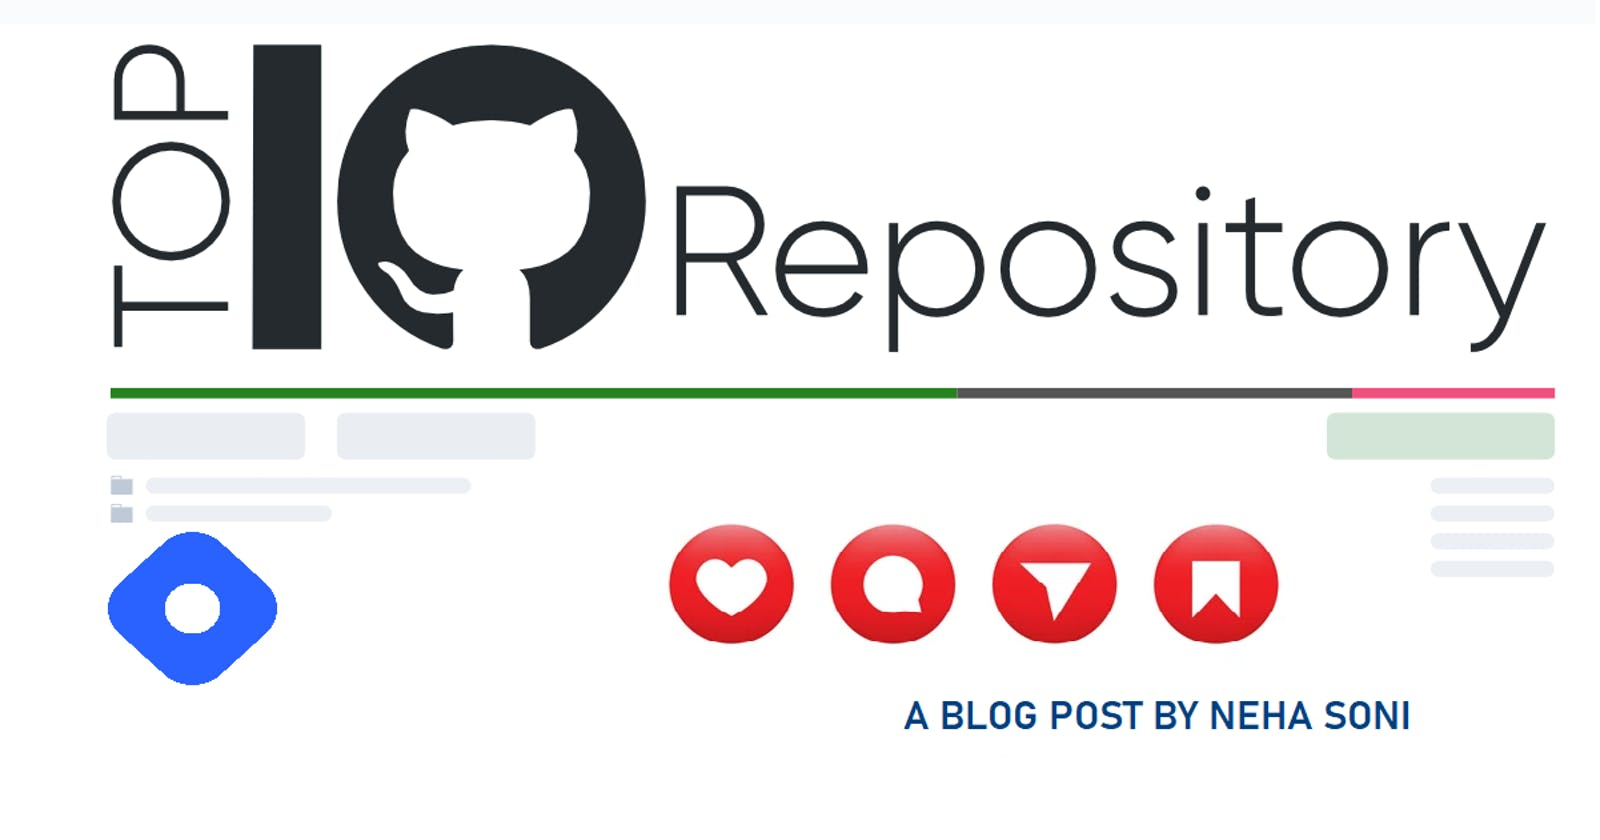 Top 10 Useful GitHub Repos for Self-Development